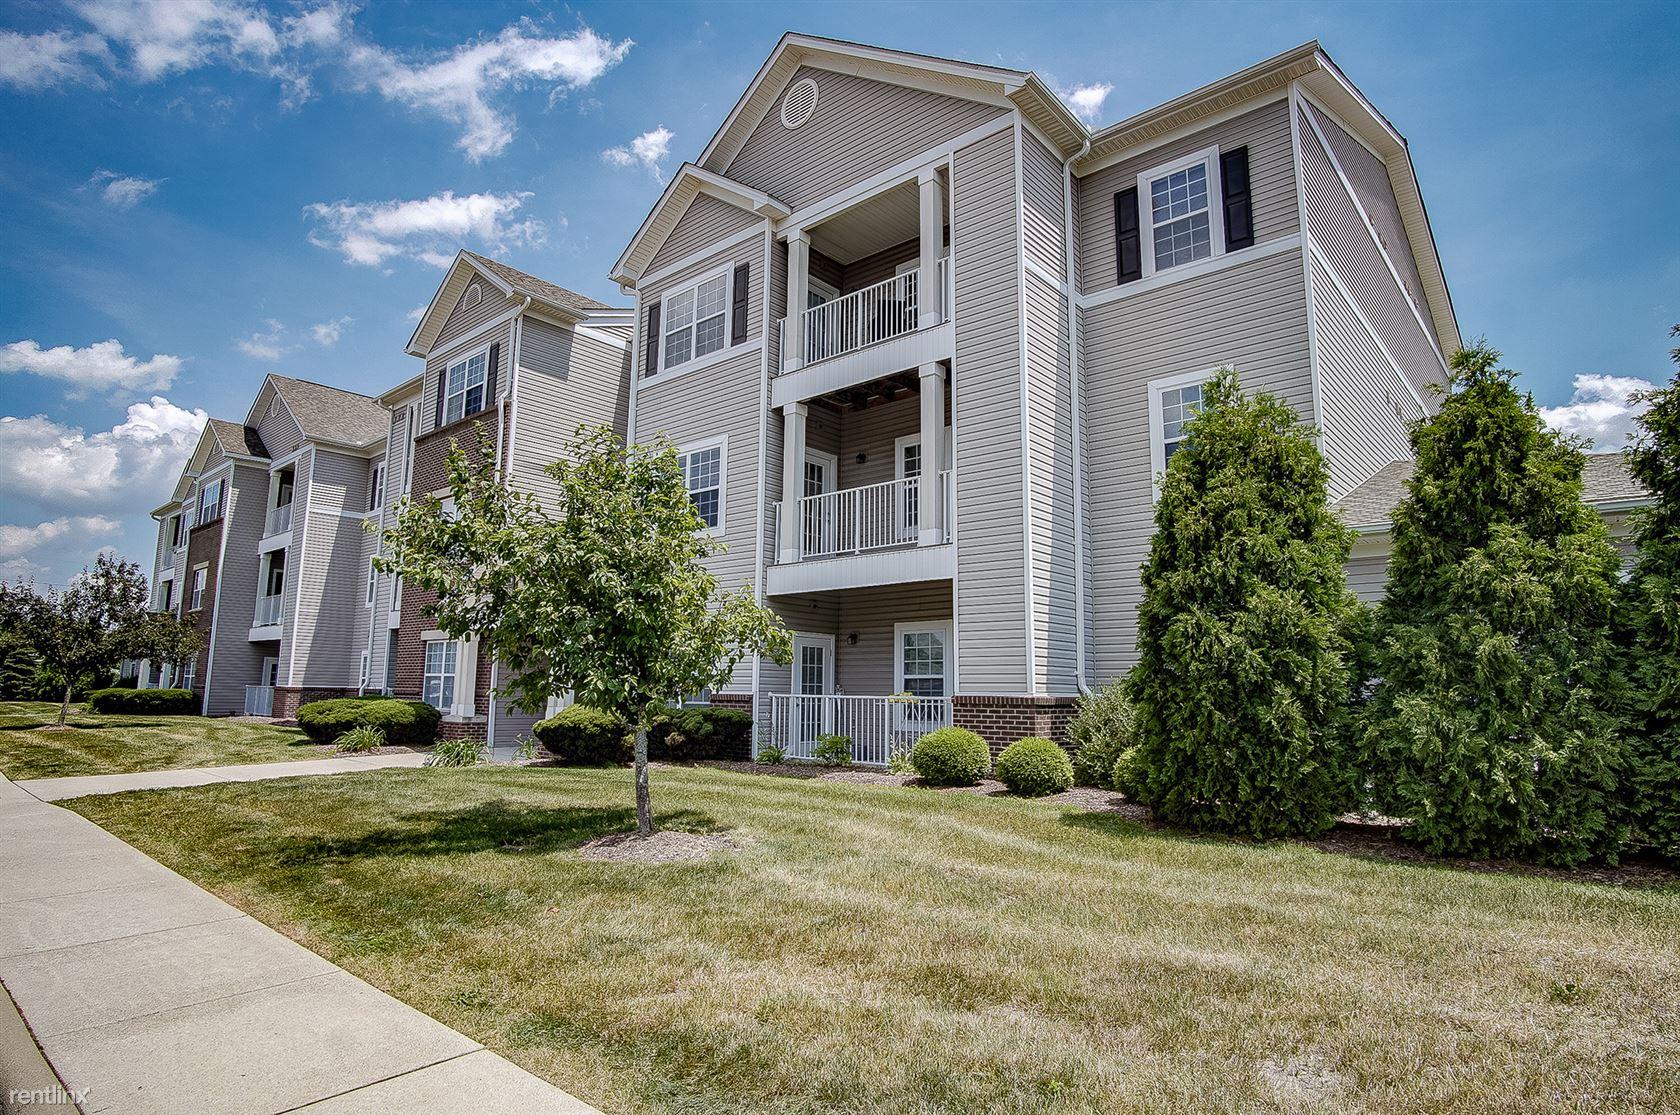 12315 Roachton Rd, Perrysburg, OH - $1,470